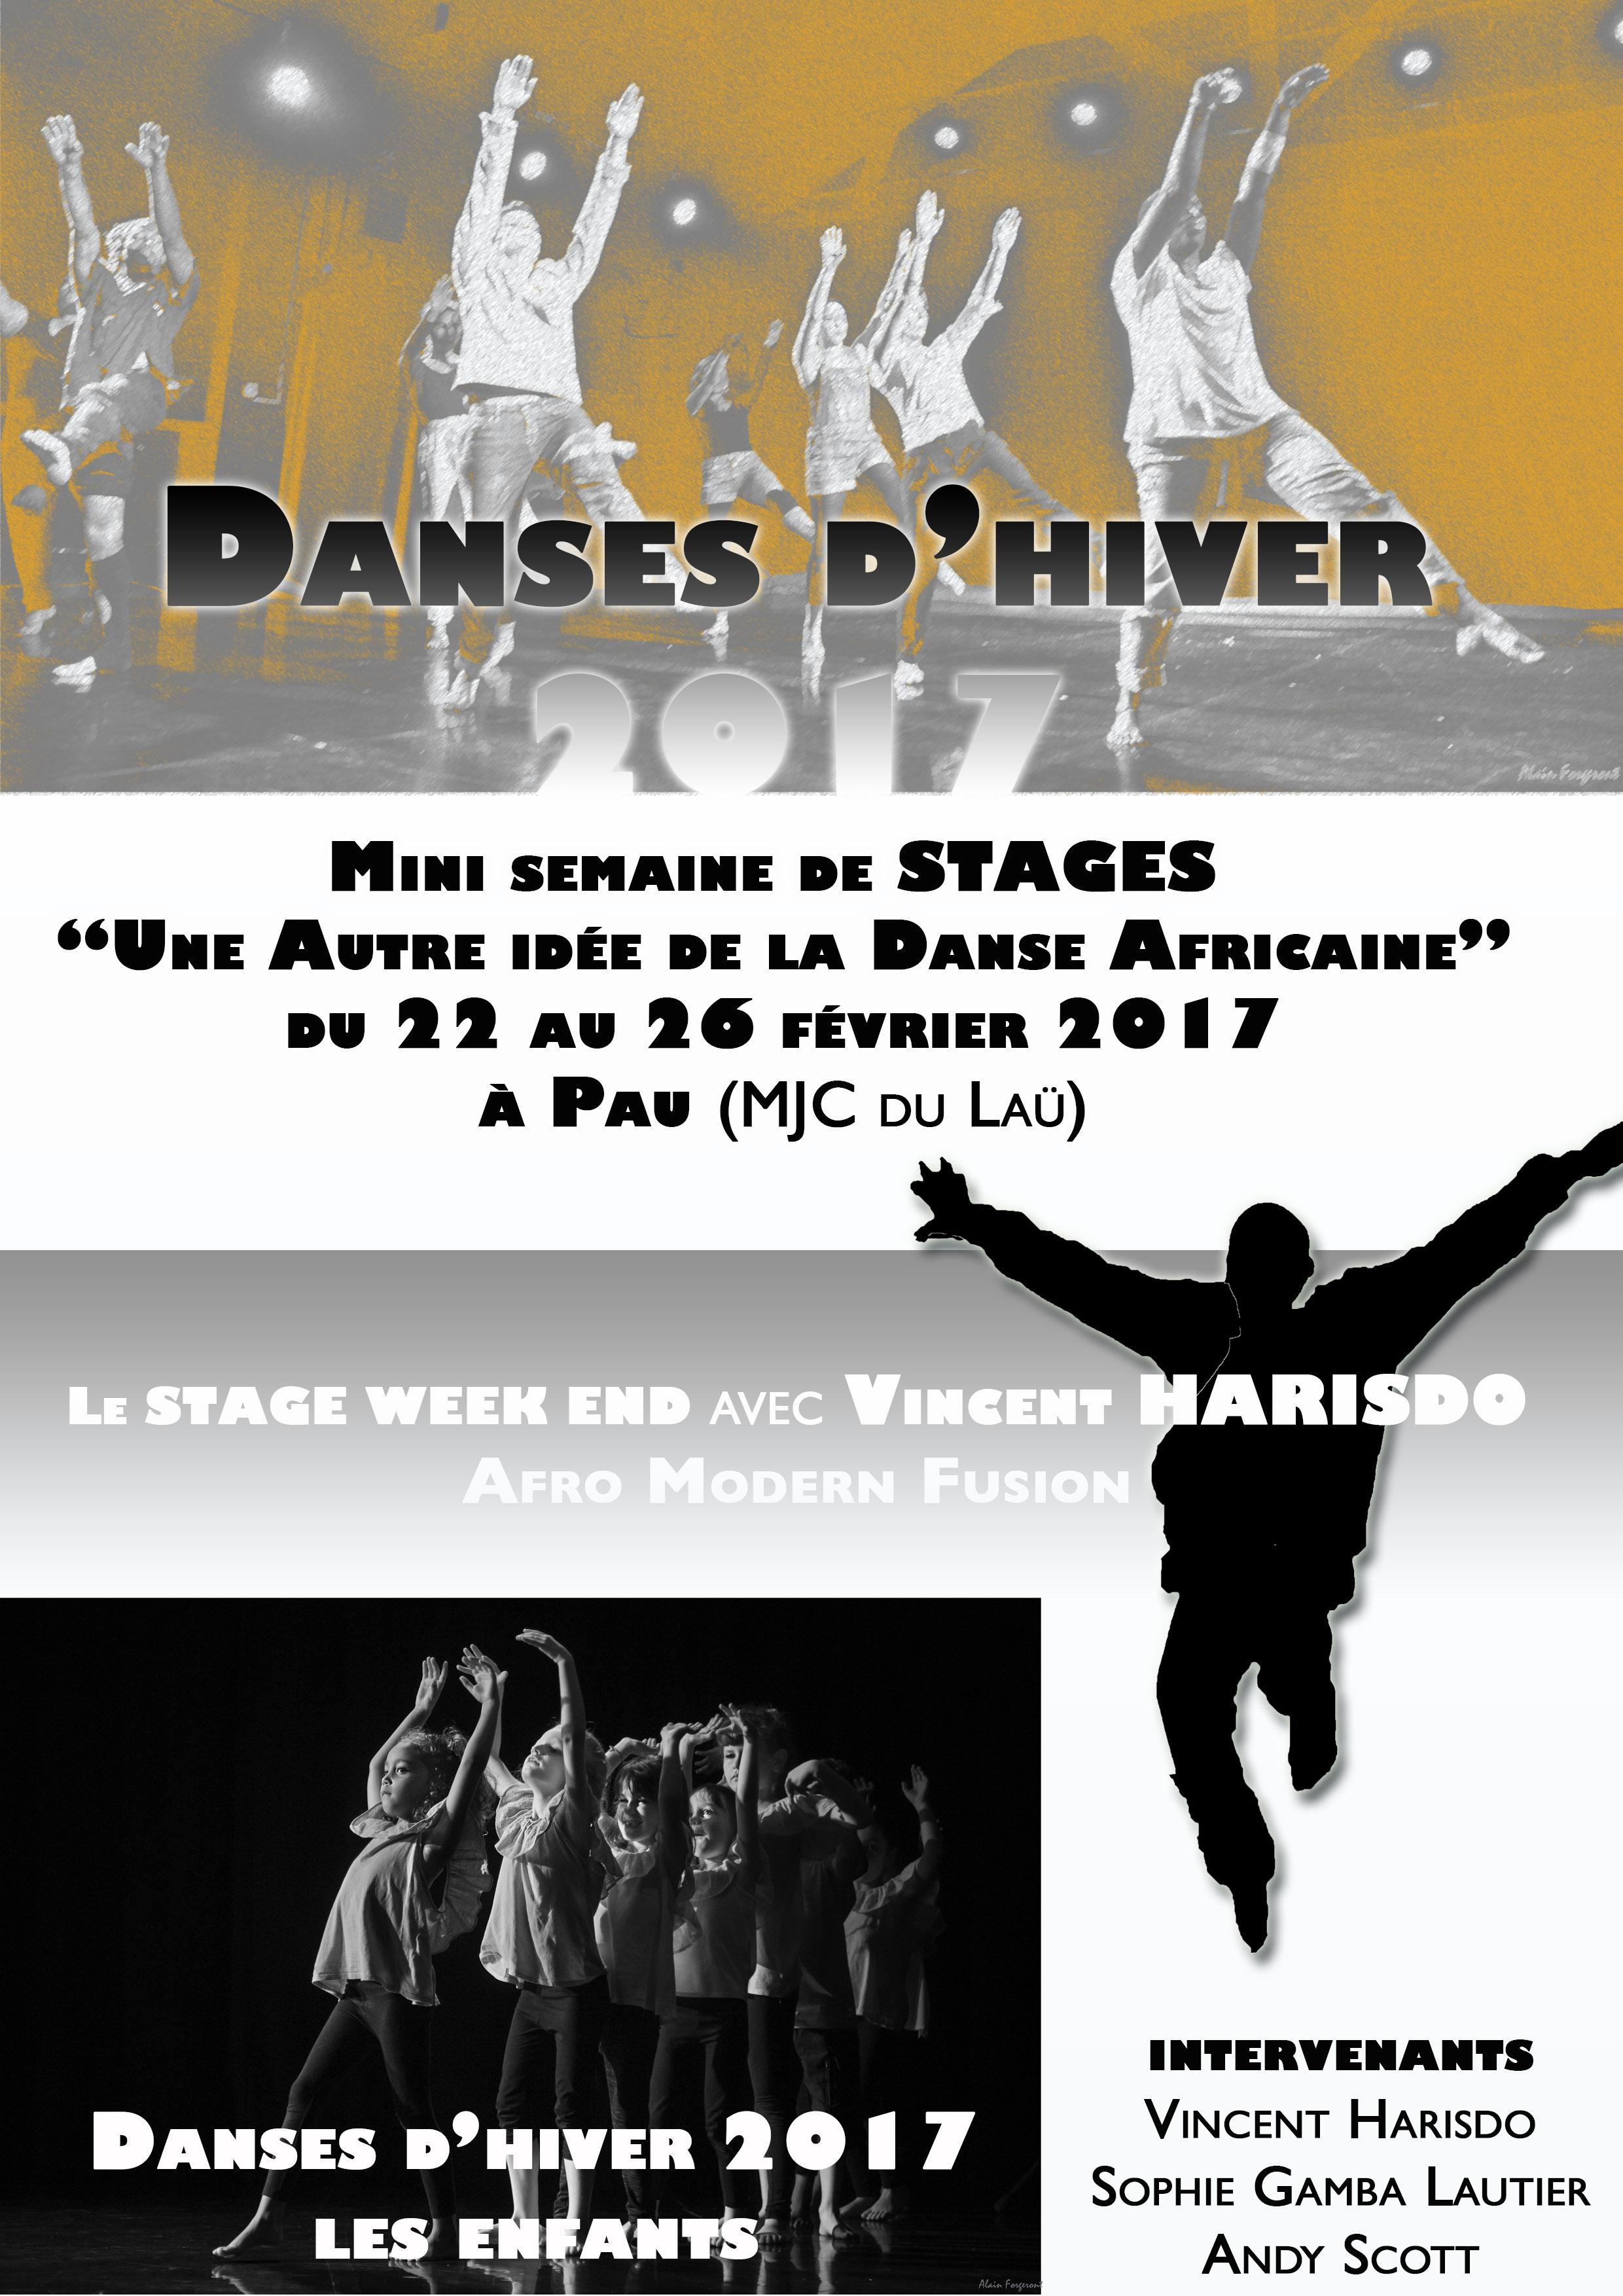 Danses d'hiver 2017